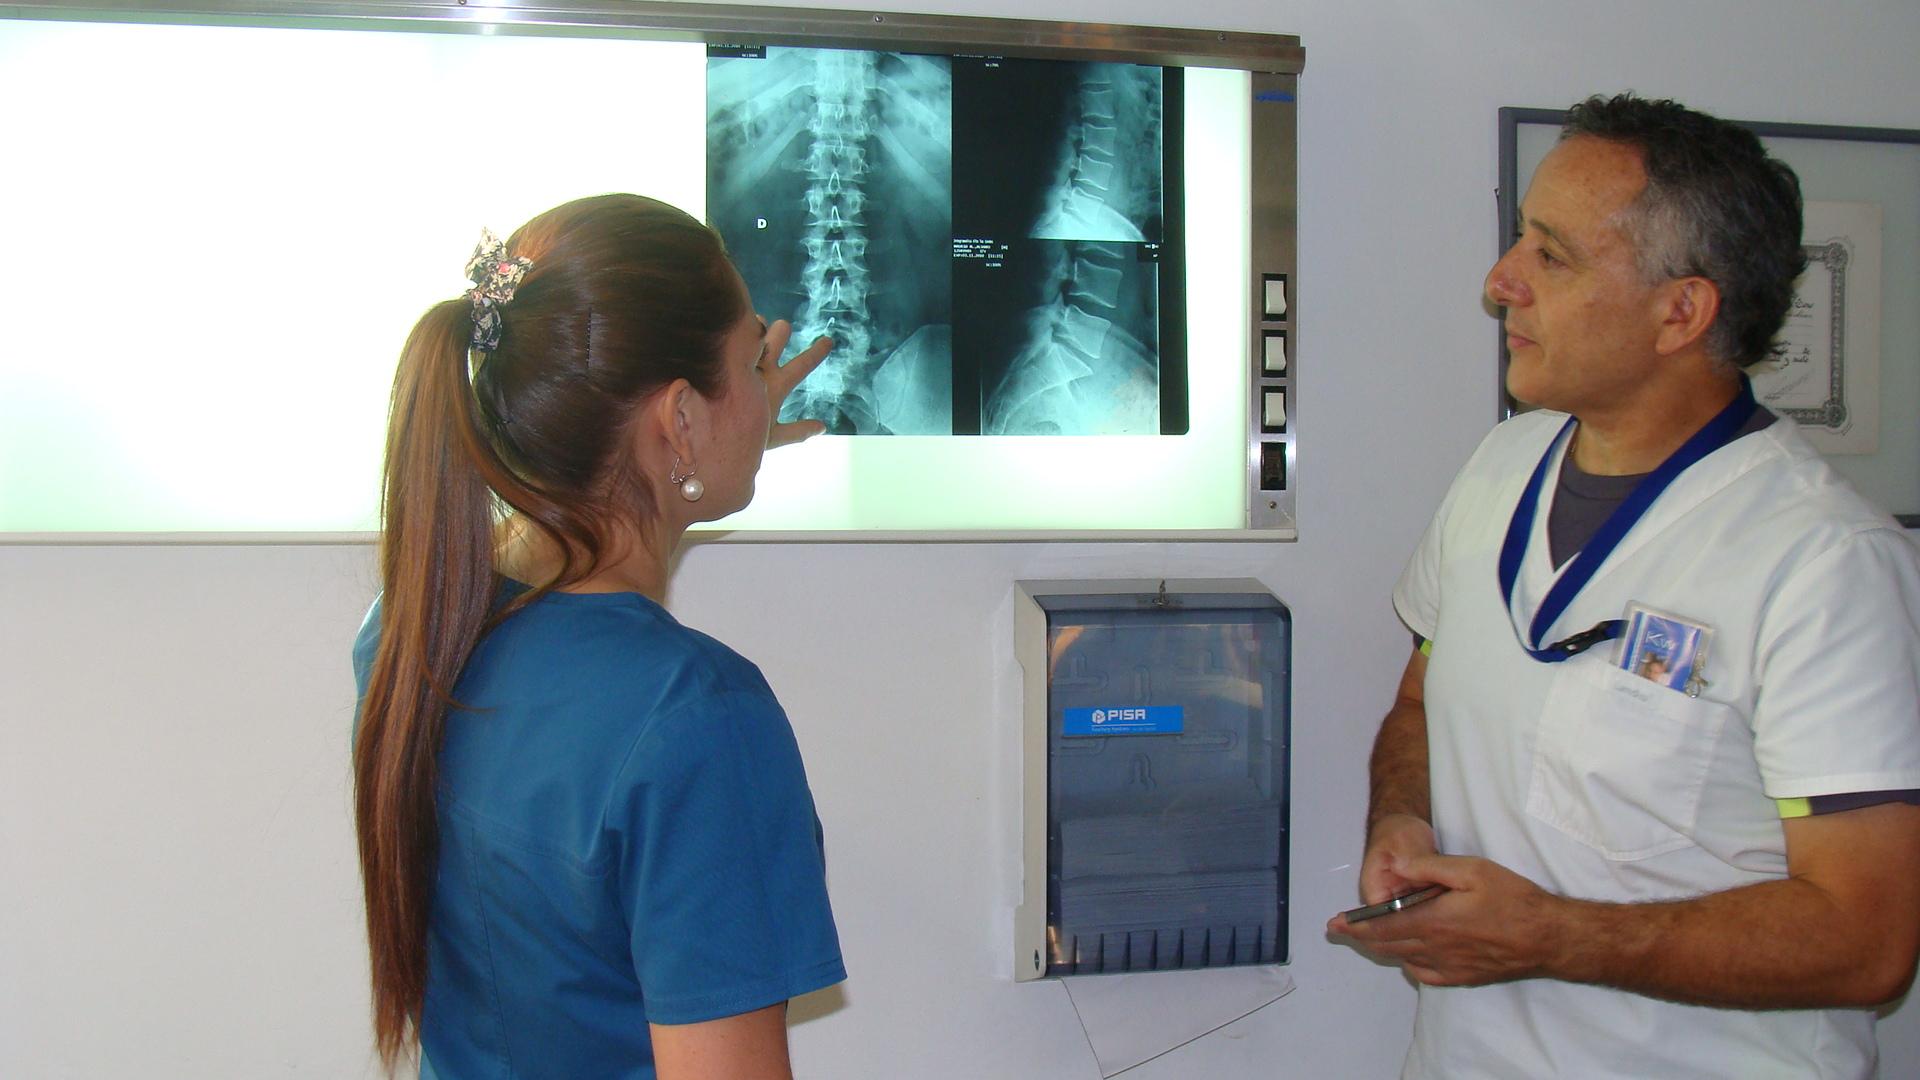 kinesiologia - kinesiologo clinica de ejercicio kw - la reina.JPG